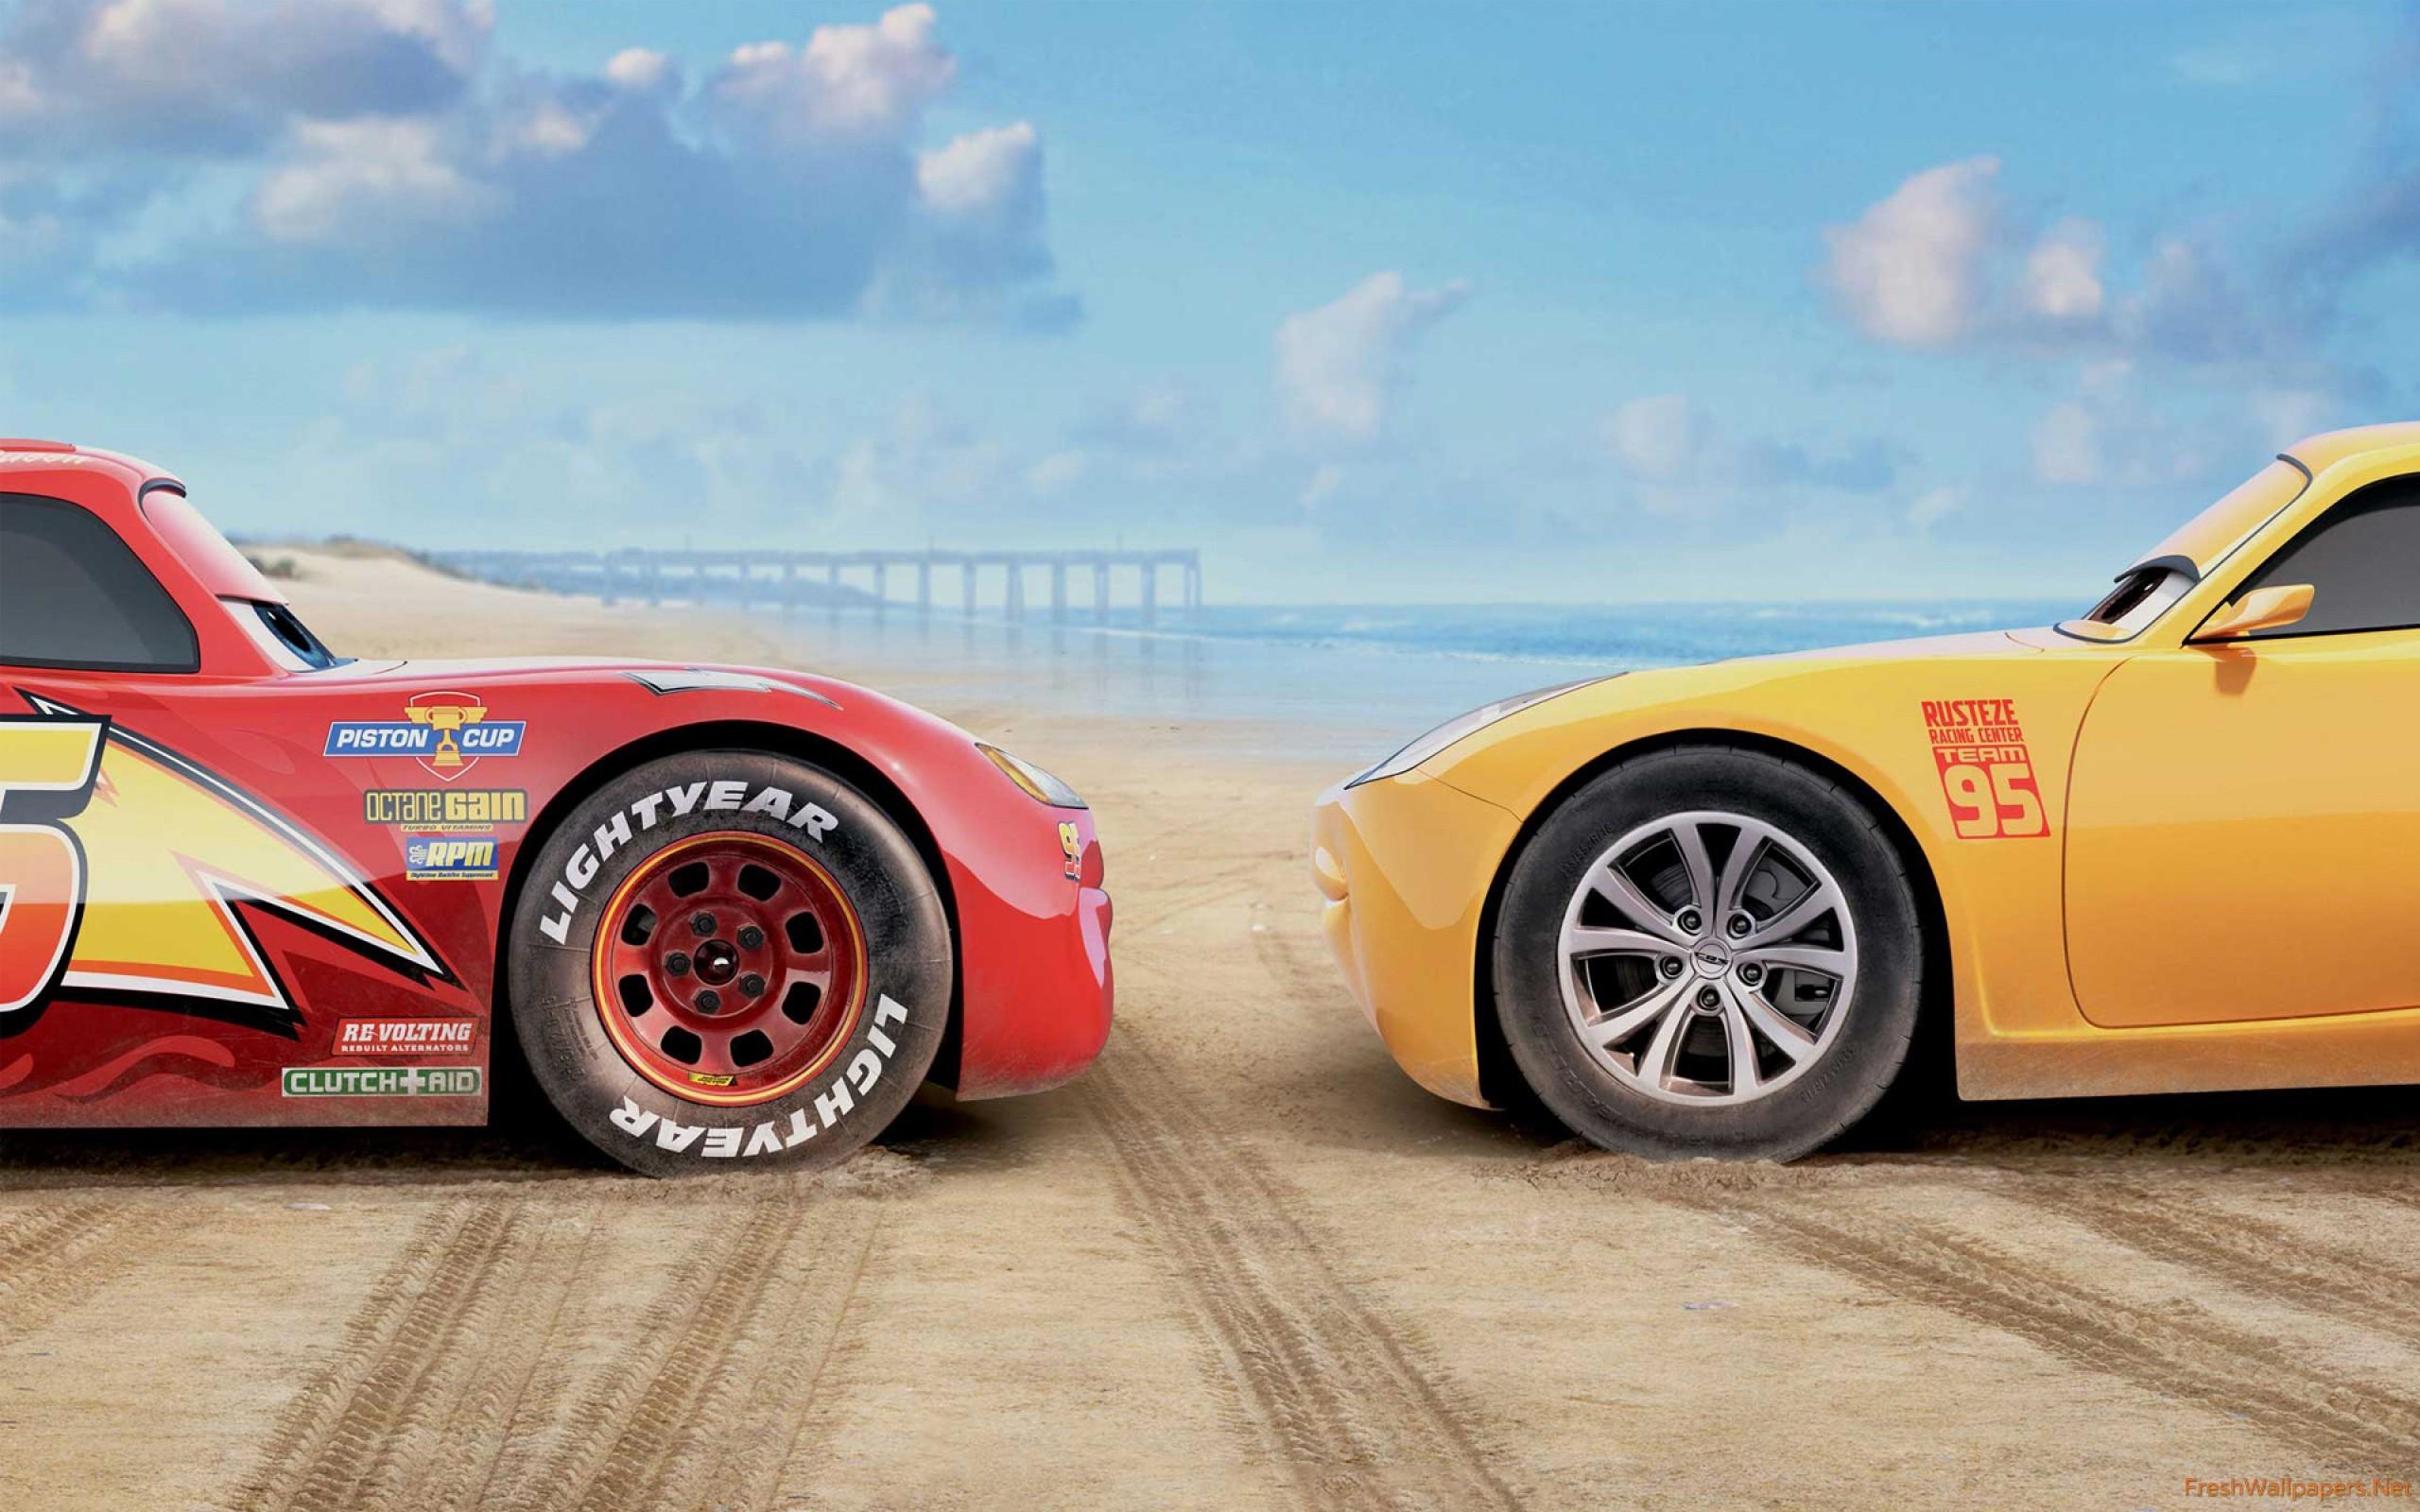 Res: 2560x1600, Cars 3 Lightning McQueen Cruz Ramirez wallpaper